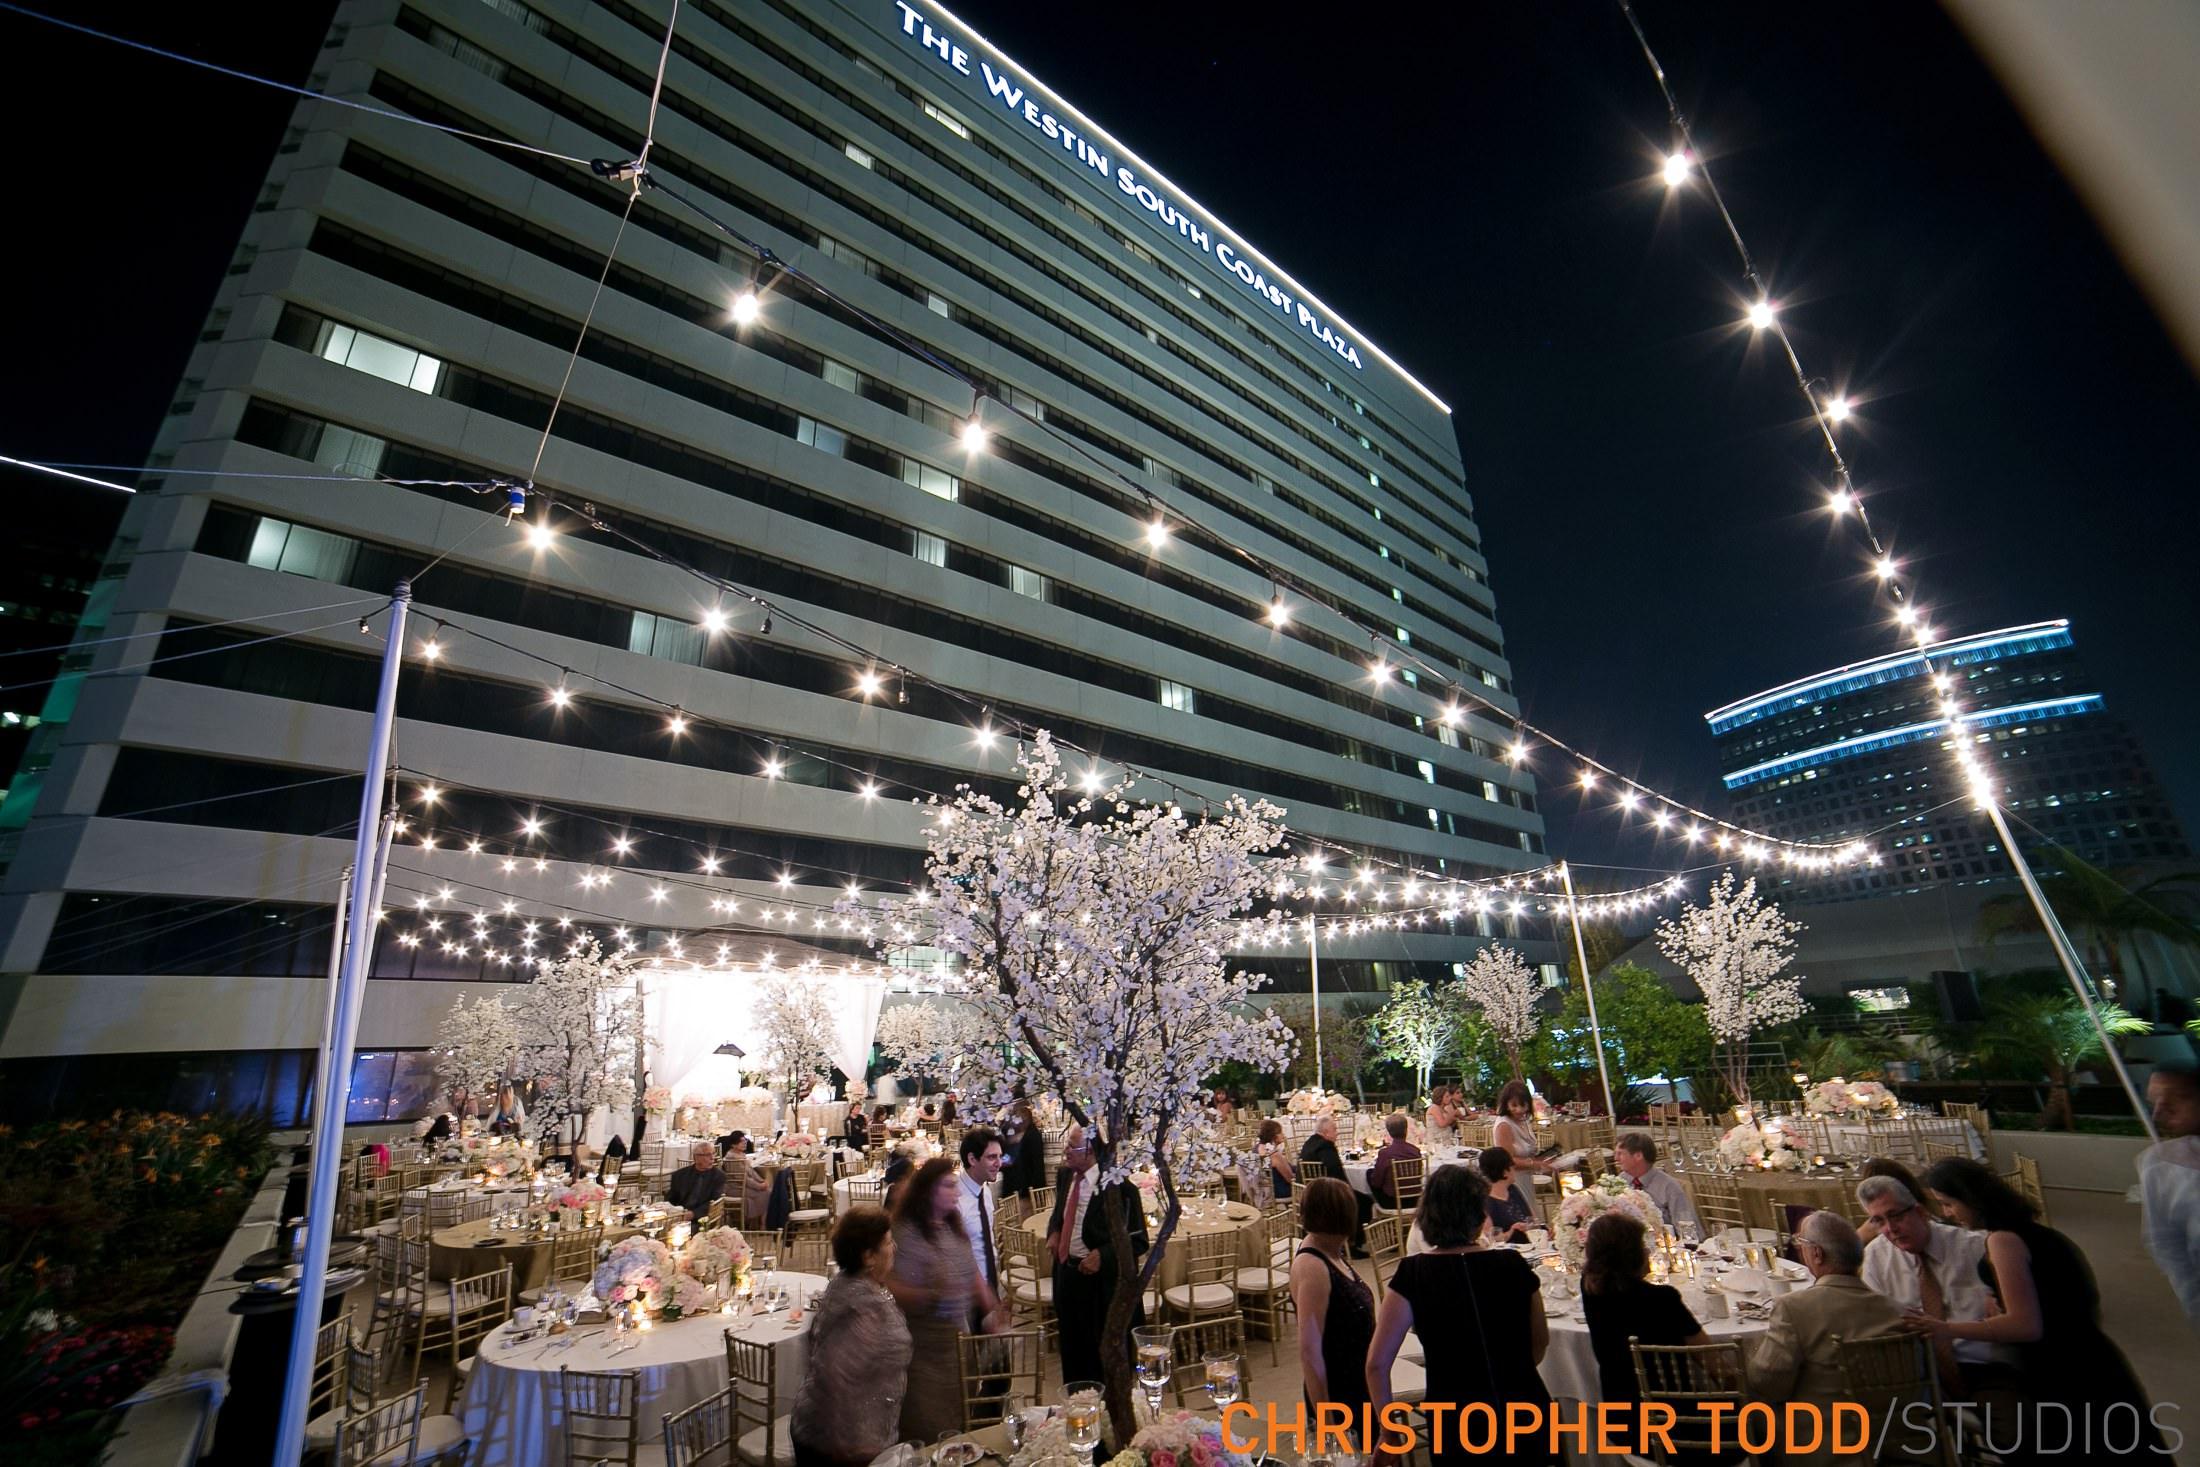 westin-south-coast-plaza-wedding-photos-1